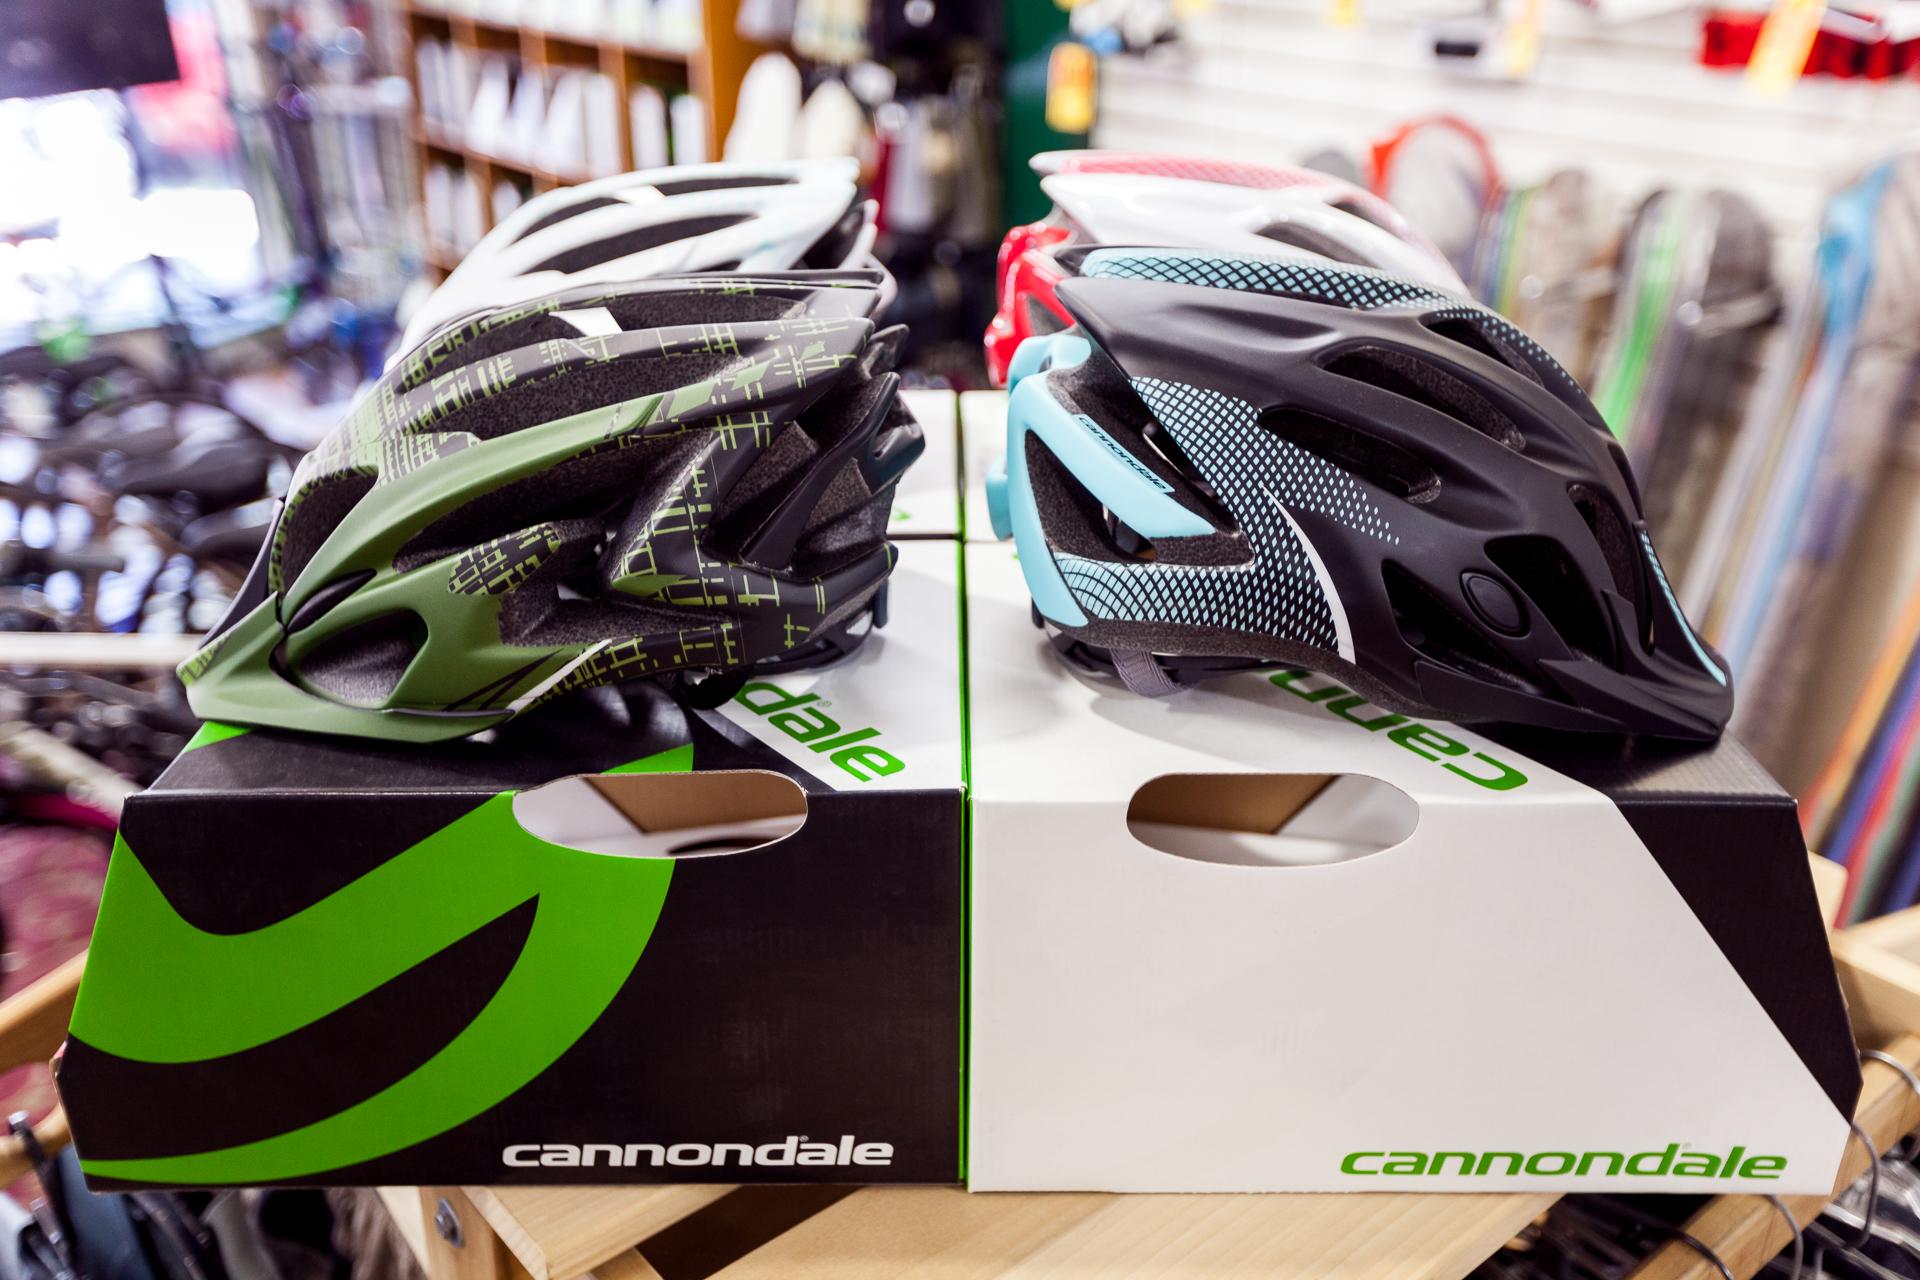 old_town_sports_novato_bike_ski_and_snowboard_shop_cannondale_helmets